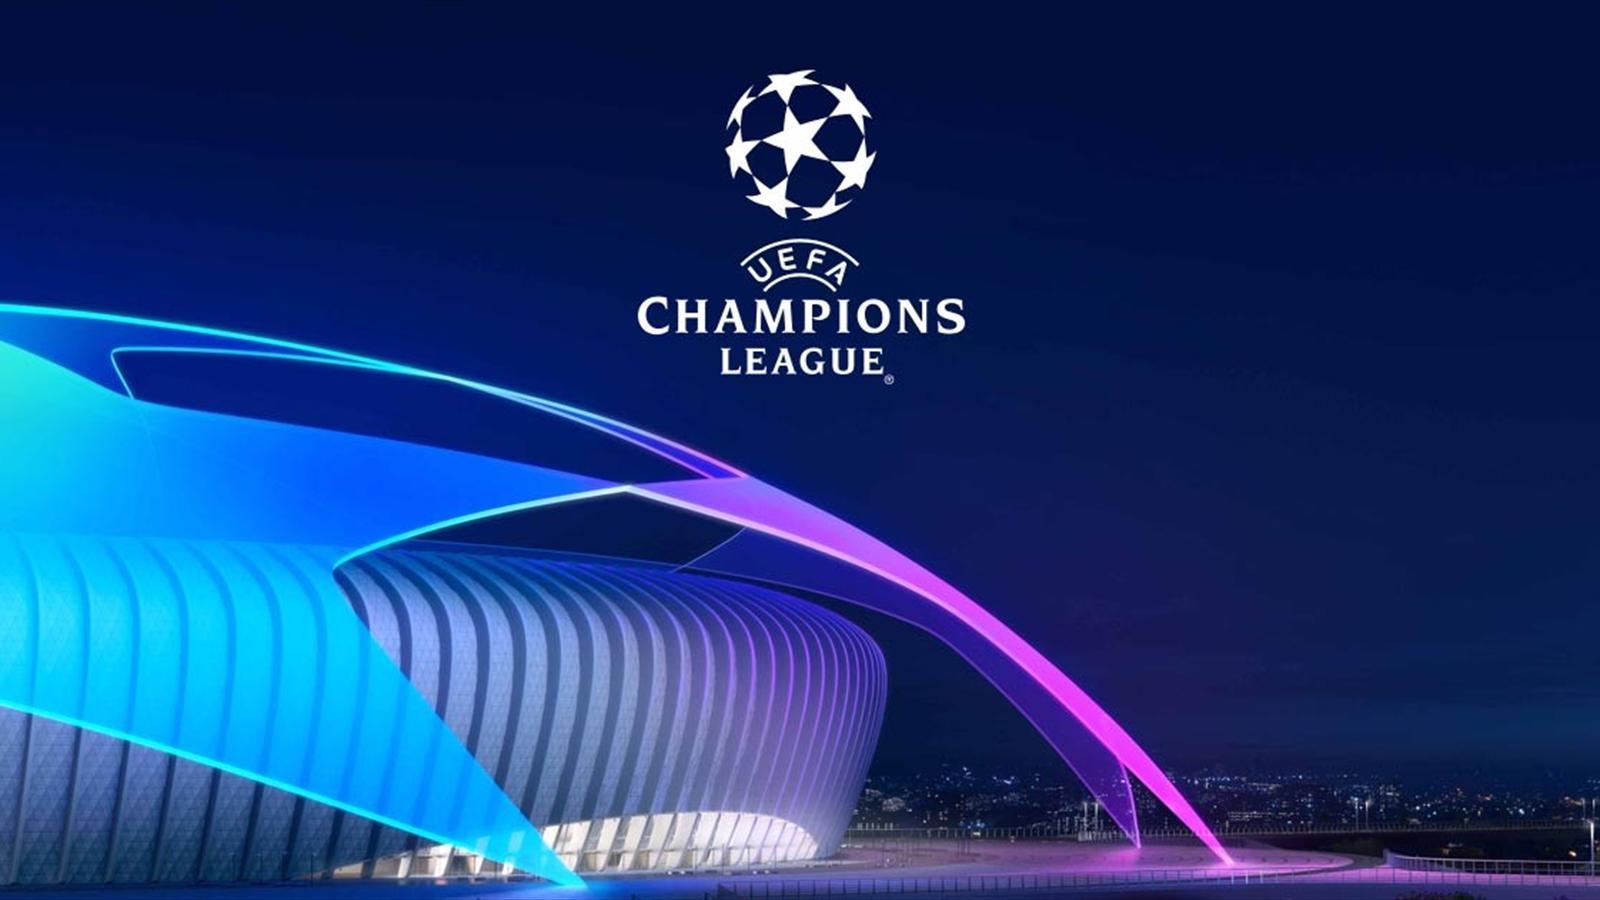 Loting Champions League 2019 Image: De Loting Van De Europa League Zie Je Op Eurosport